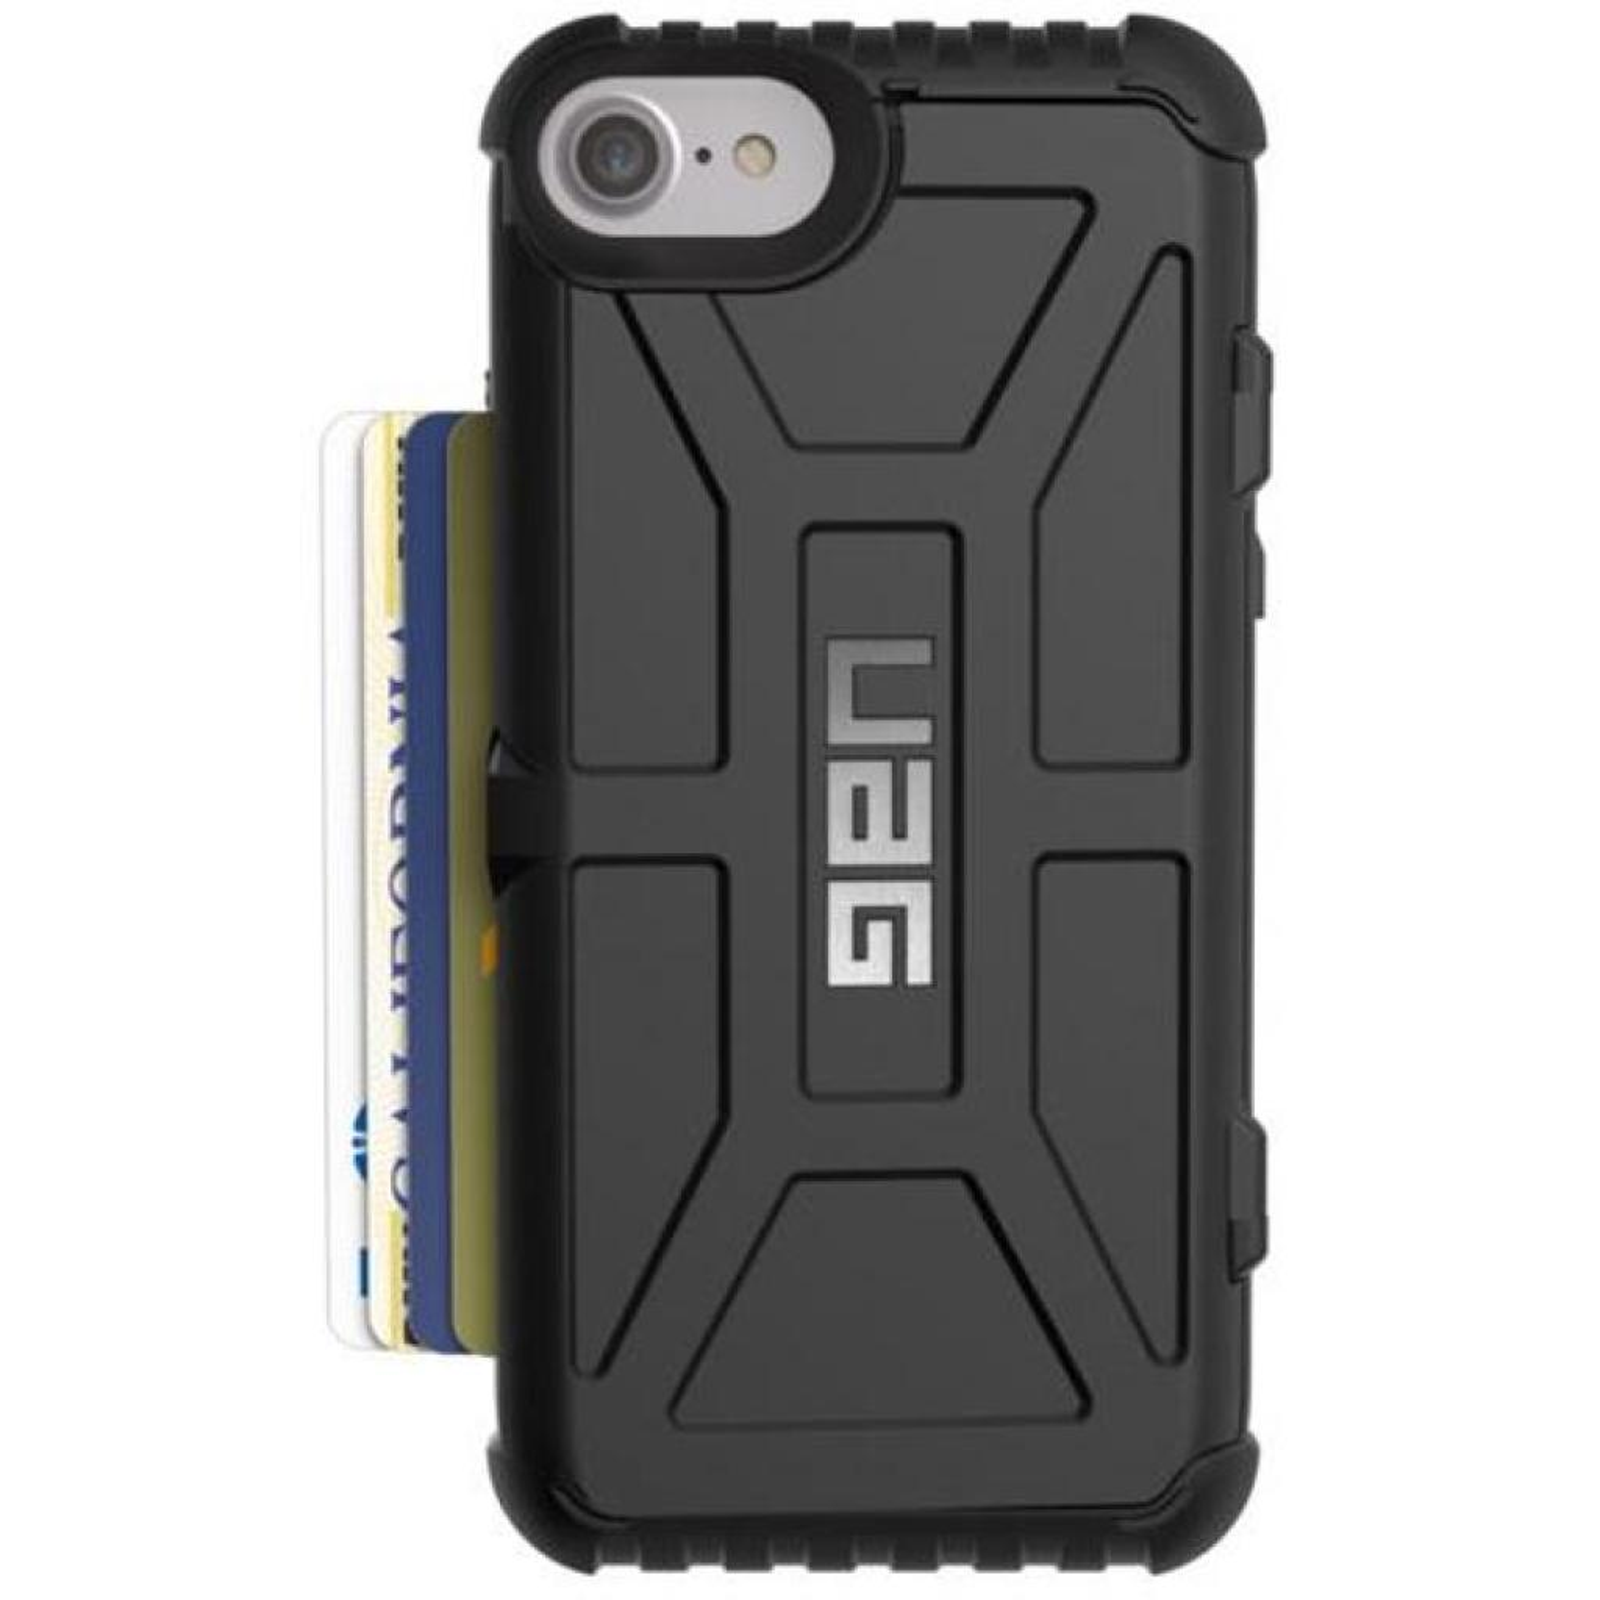 Чехол для моб. телефона Uag iPhone 8/7/6S/6 Trooper Case Black (IPH7/6S-T-BK)